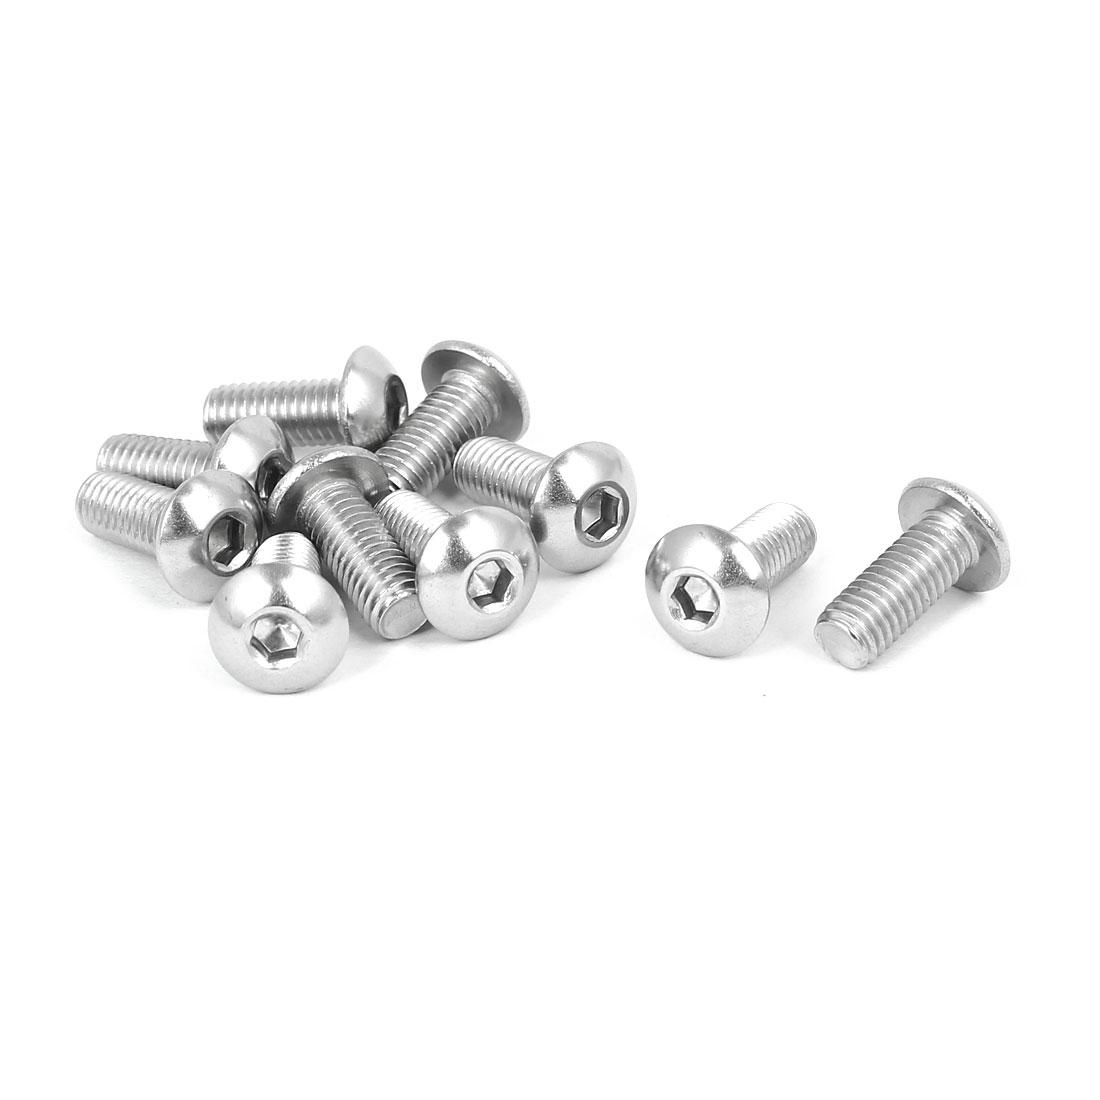 M5x12mm Thread 316 Stainless Steel Button Head Hex Socket Cap Screw Bolt 10pcs